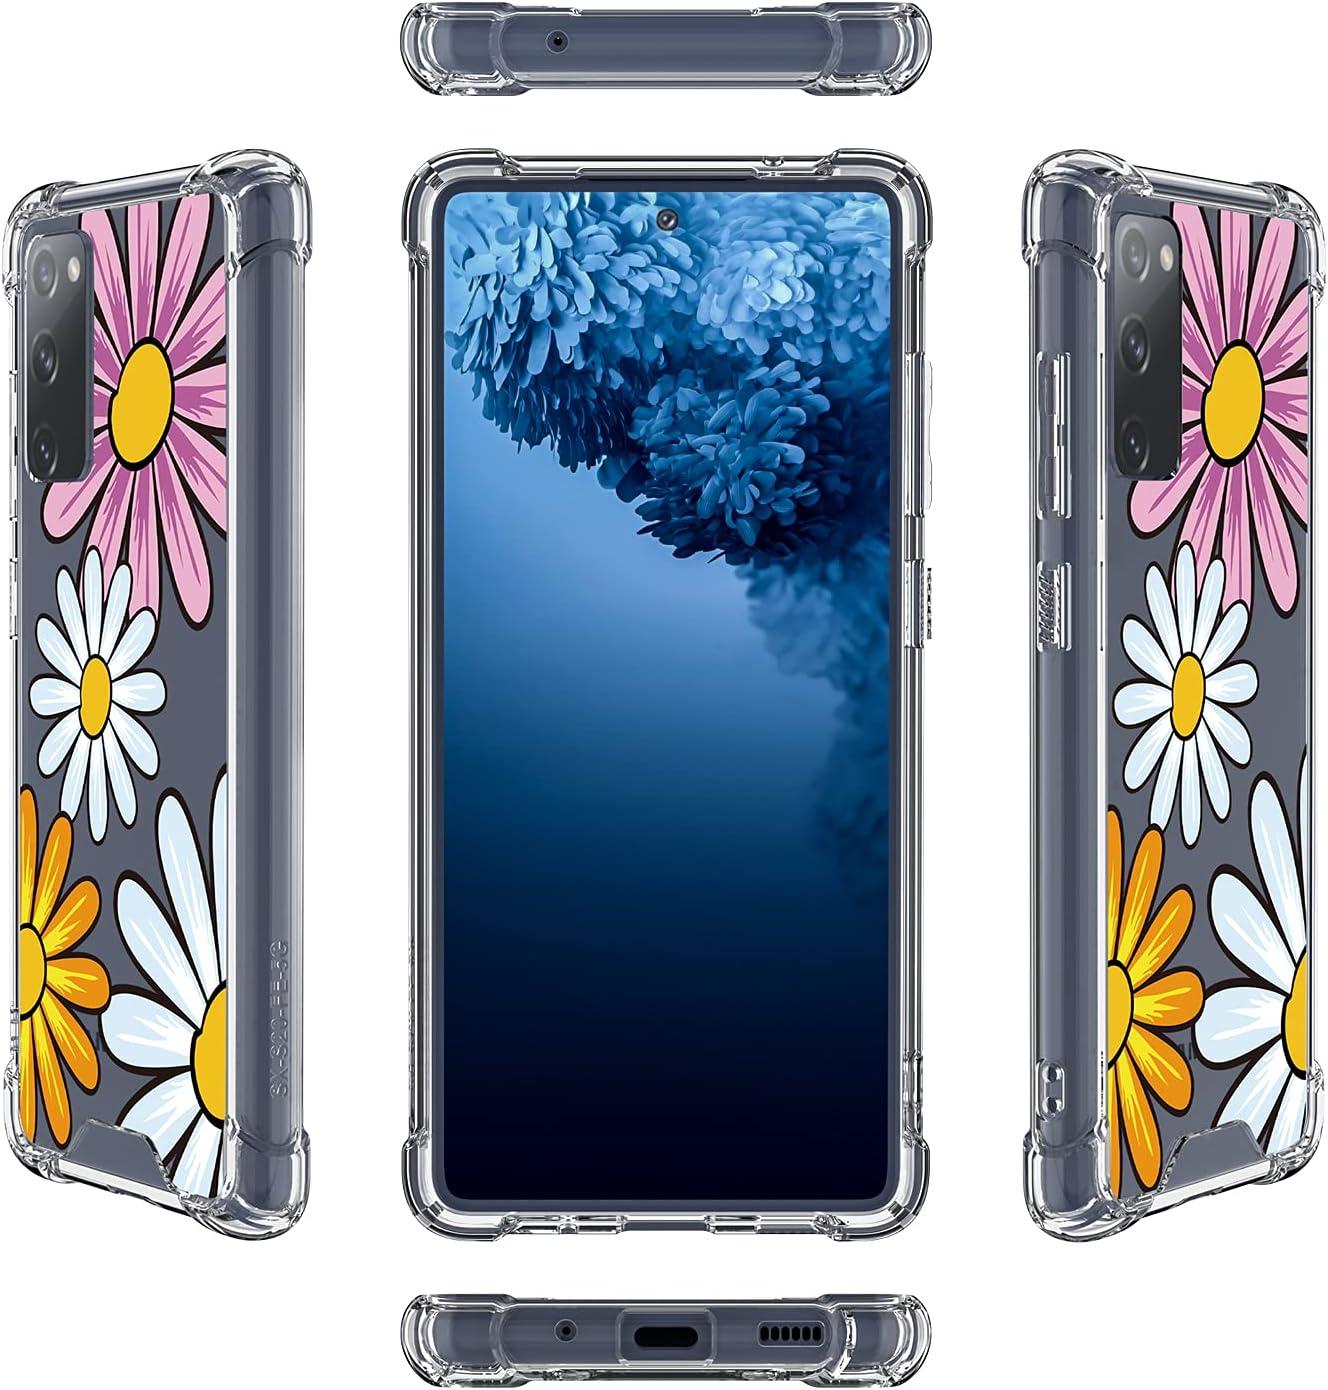 Tnarru Compatible with Samsung Galaxy S20 FE 5G Case Clear Colourful Flower Hard PC+ Soft TPU Bumper Cover Anti-Scratch Shockproof Slim Thin Protective Case for Samsung Galaxy S20 FE 5G